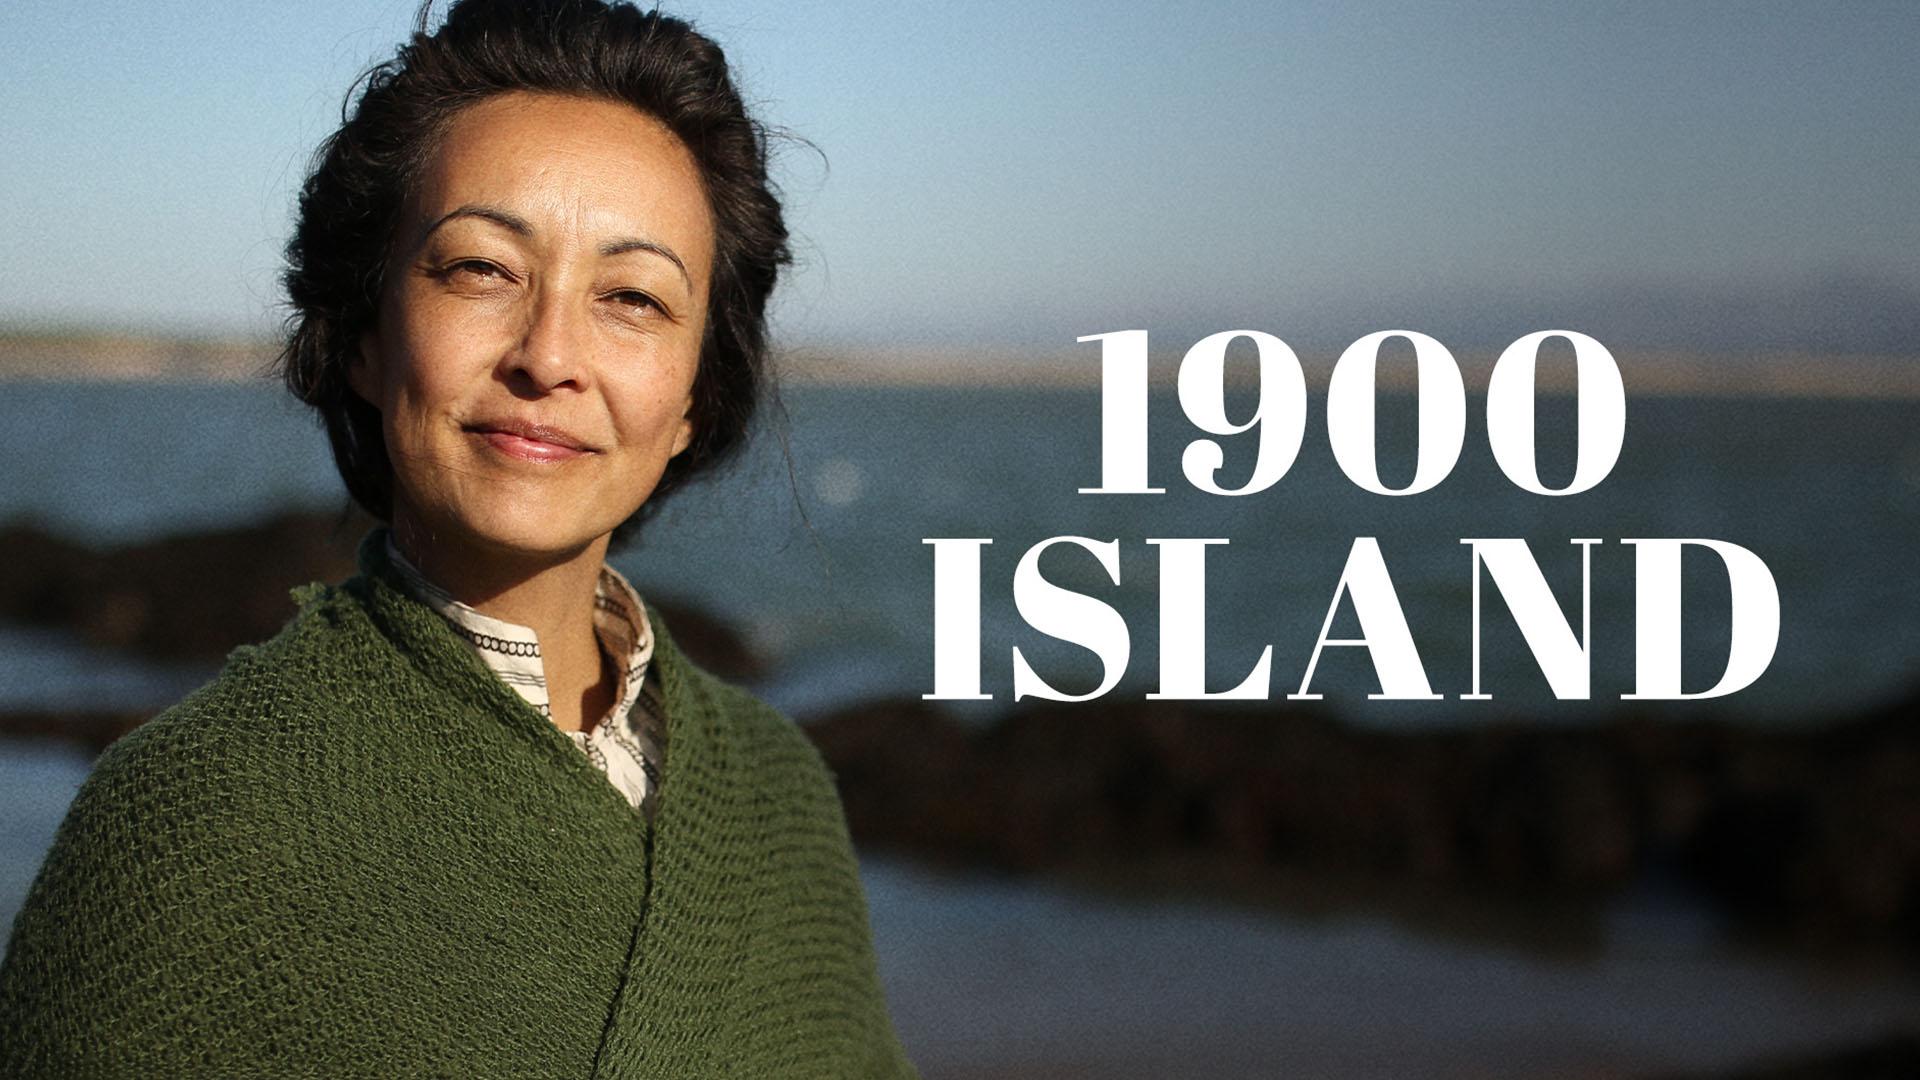 1900 Island